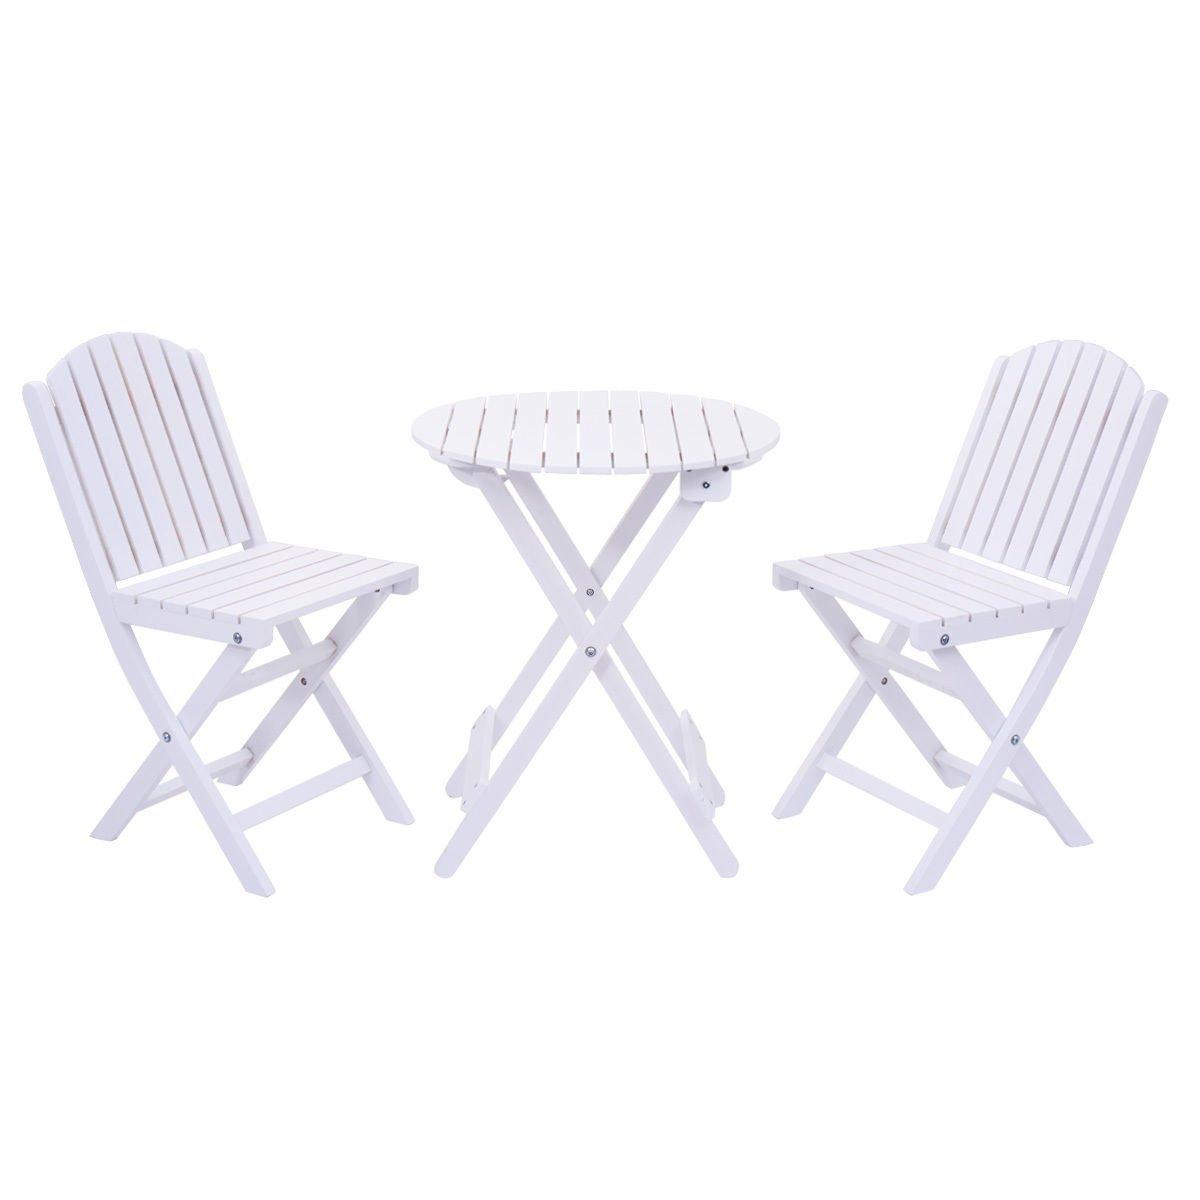 Giantex 3 Piece Table Chair Set Wood Folding Outdoor Patio Garden Pool Furniture (White)